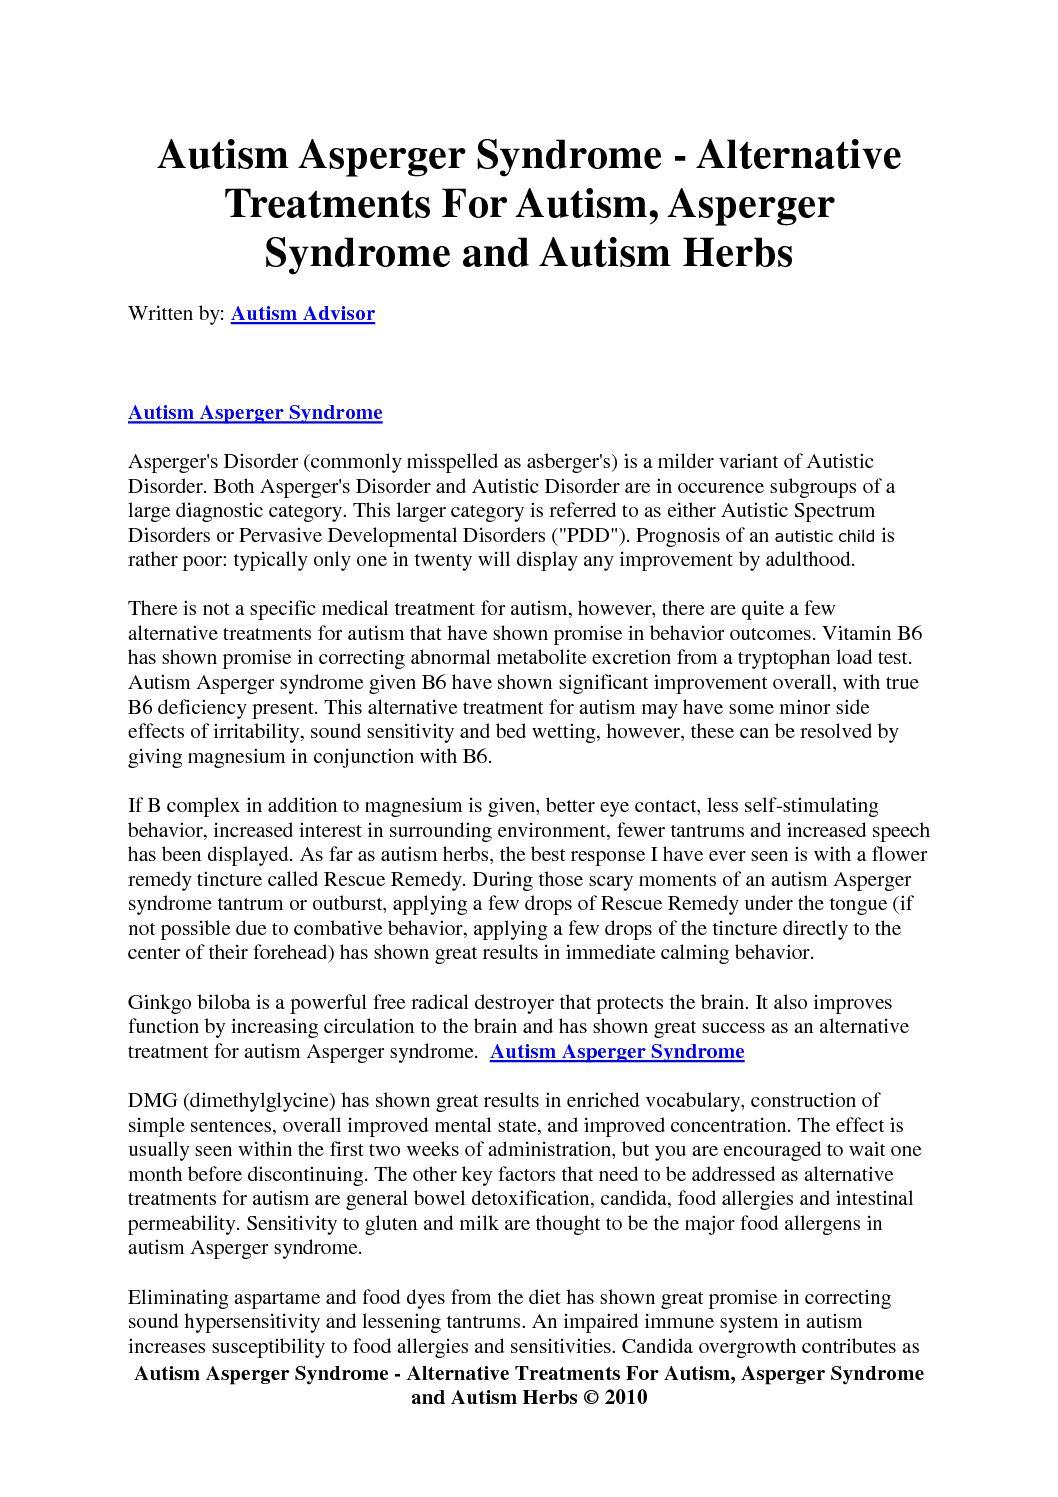 Do Alternative Treatments For Autism >> Calameo Autism Asperger Syndrome Alternative Treatments